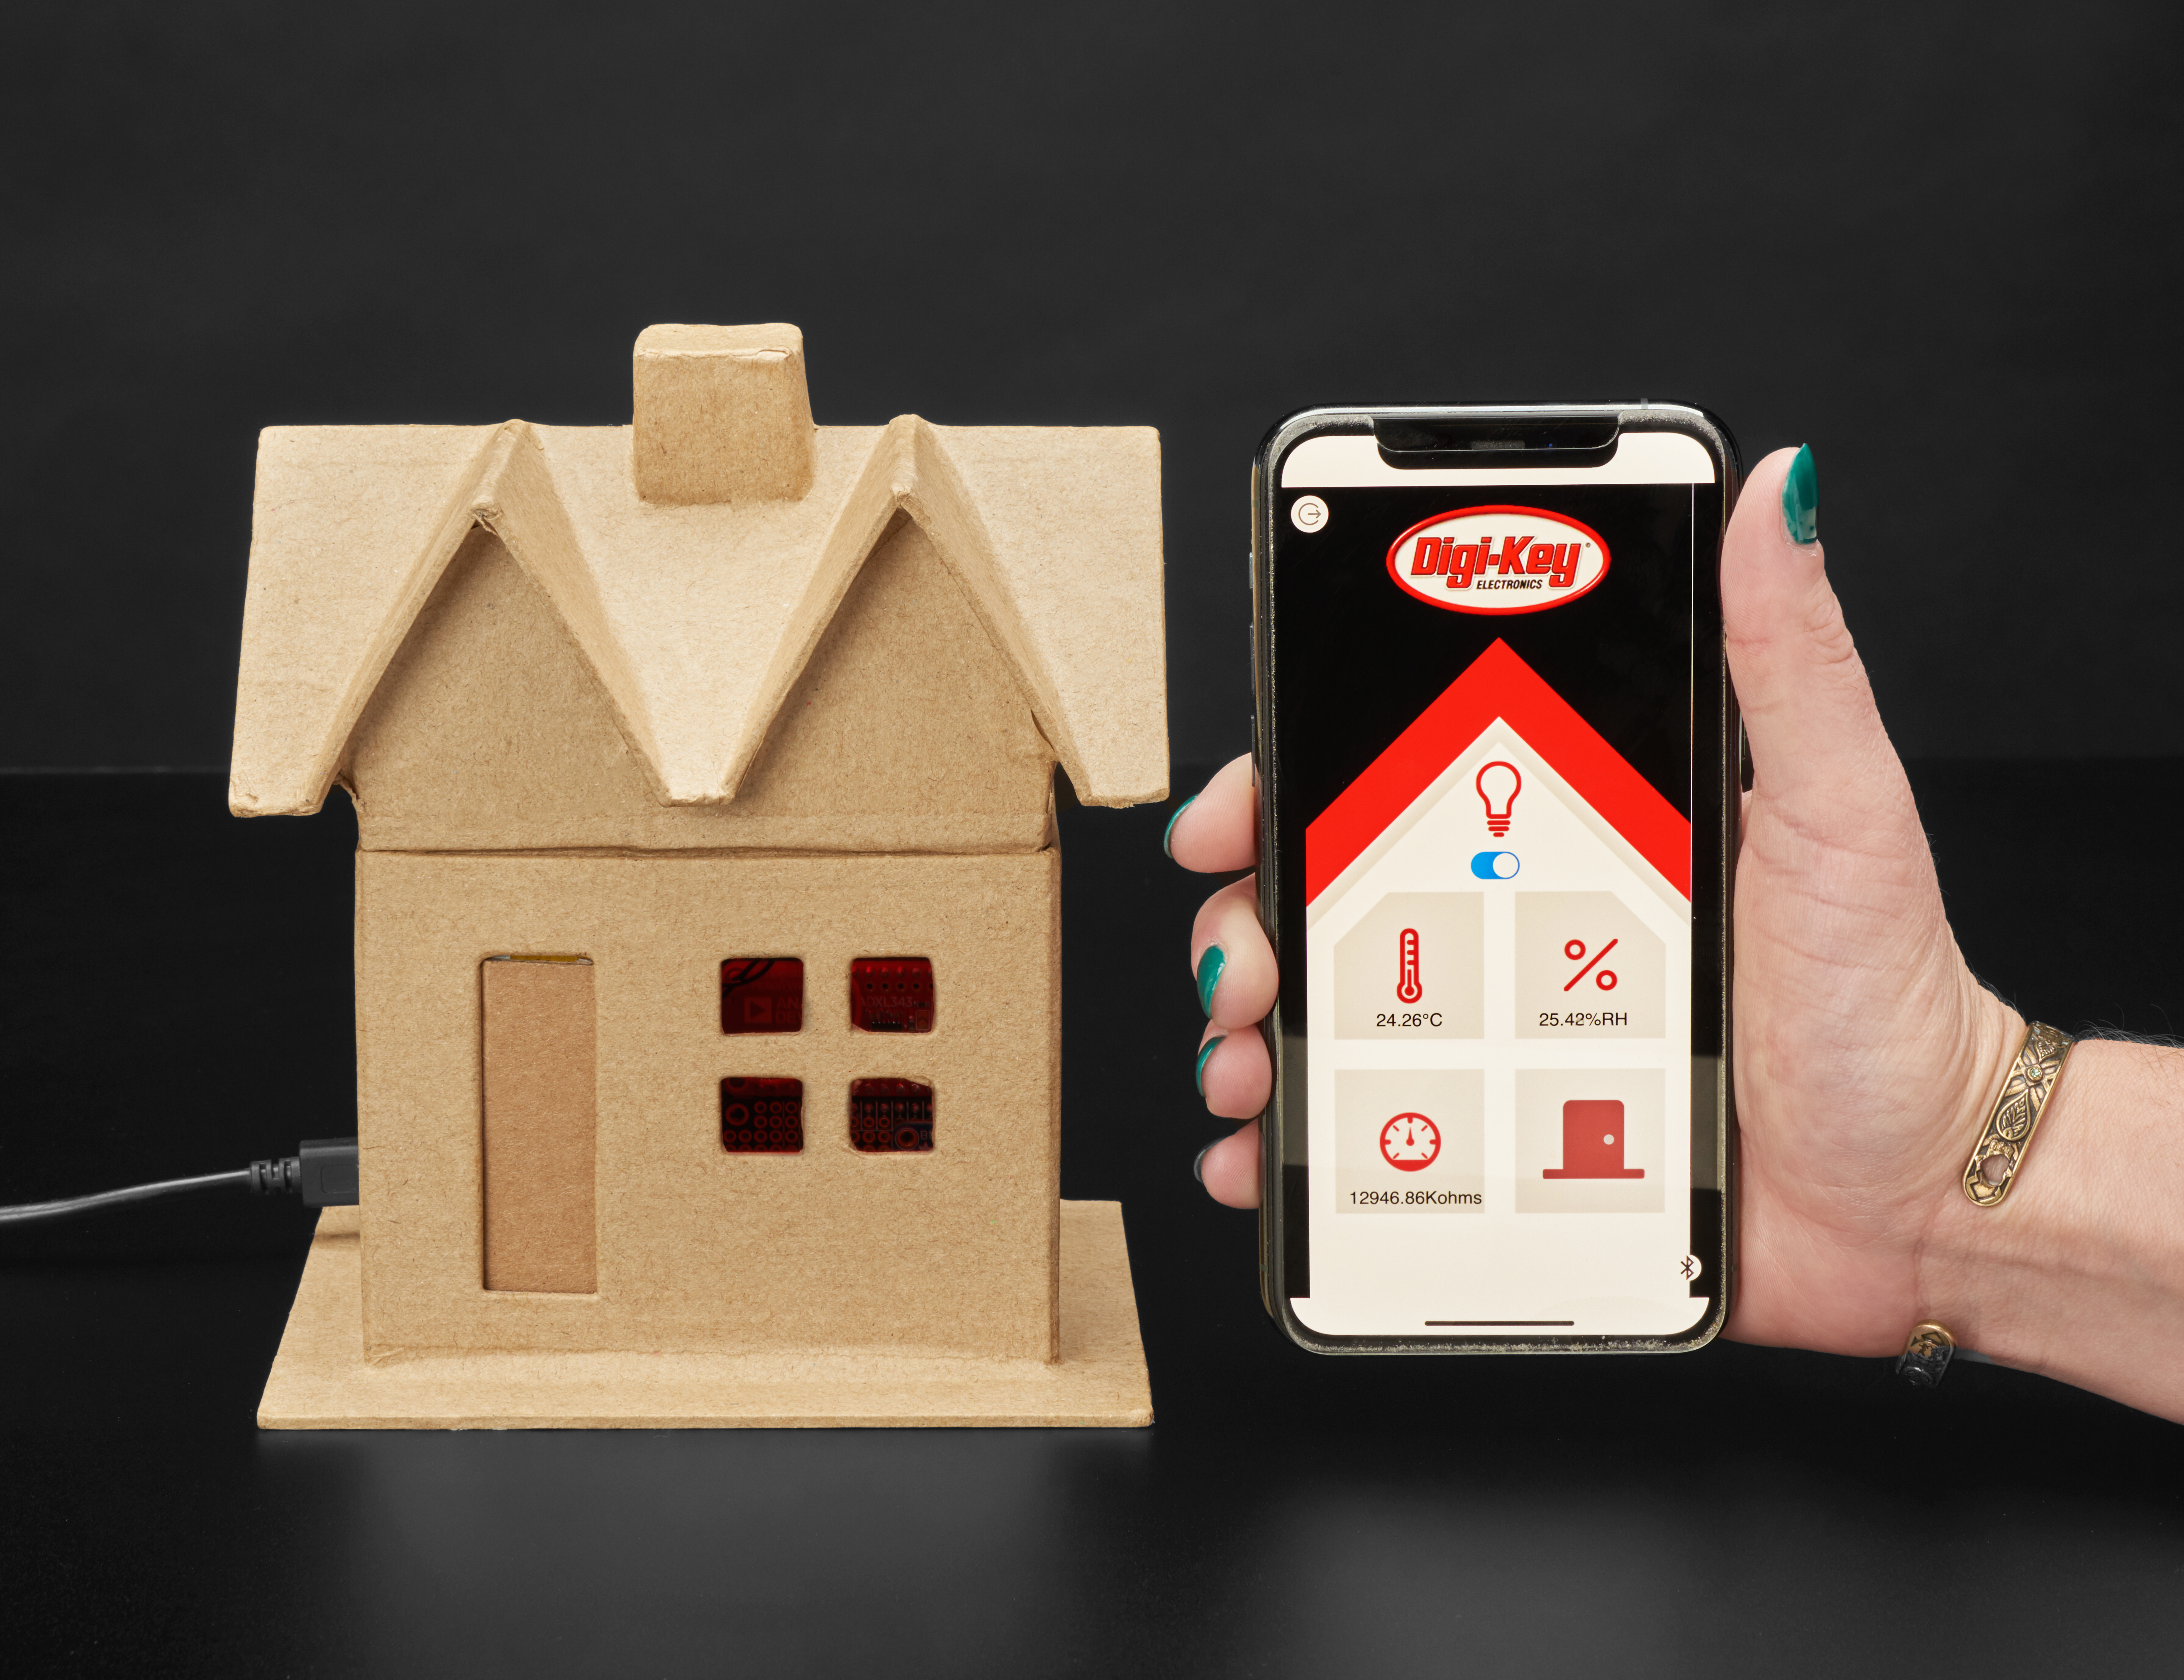 sensors_DigiKey_IoT_Home_Kit_demo_ORIG_2019_12.jpg